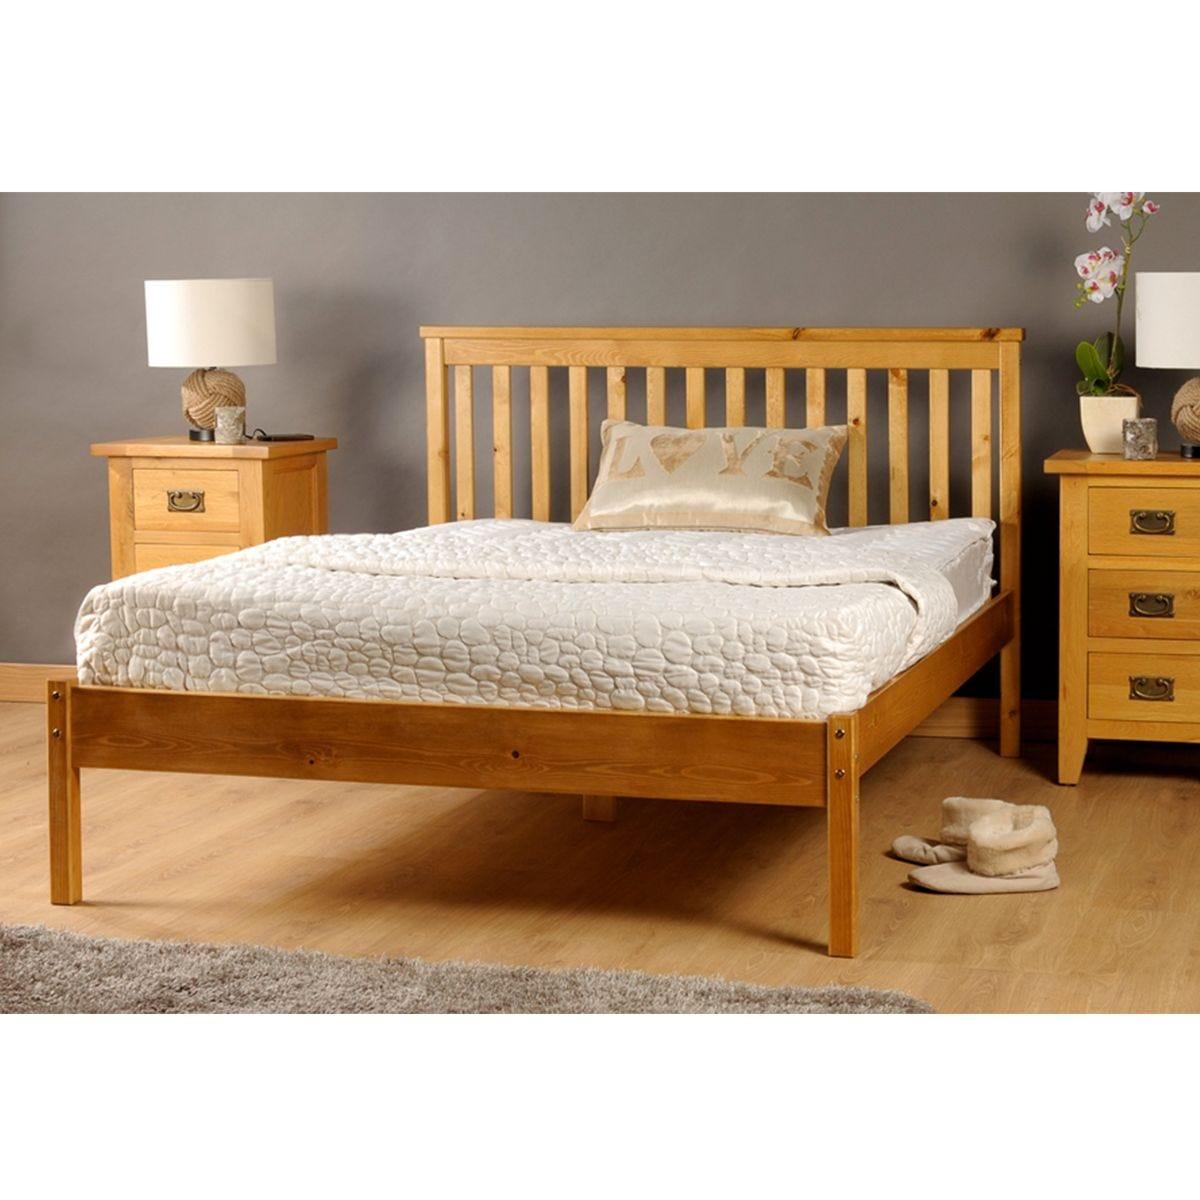 Riga Bed Frame - Caramel